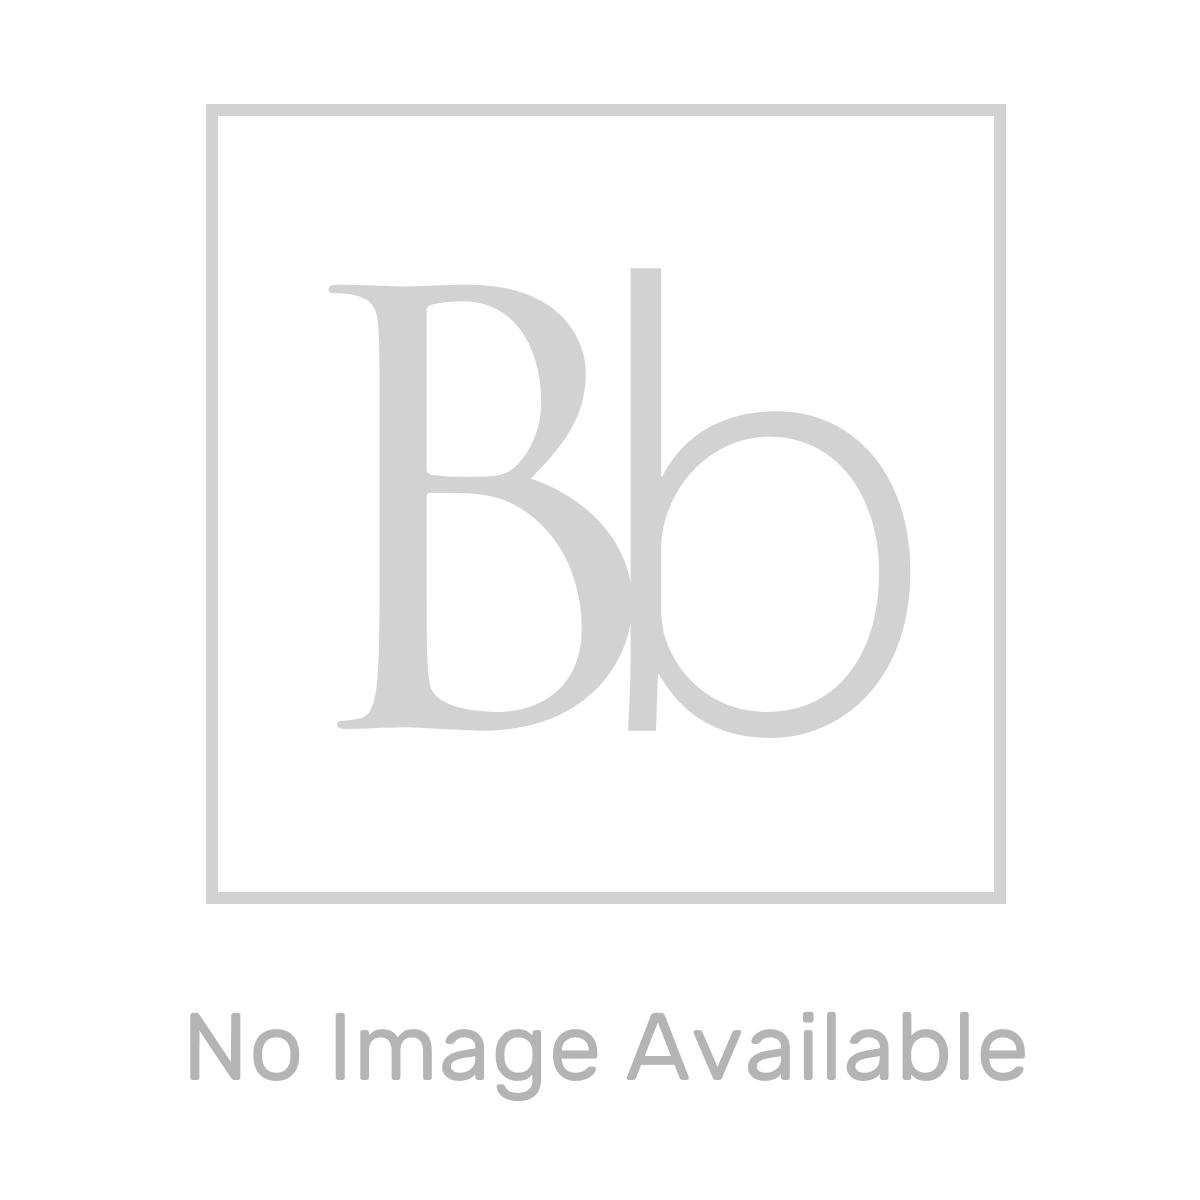 Ikoma White Gloss Vanity Unit with Basin 650mm Lifestyle